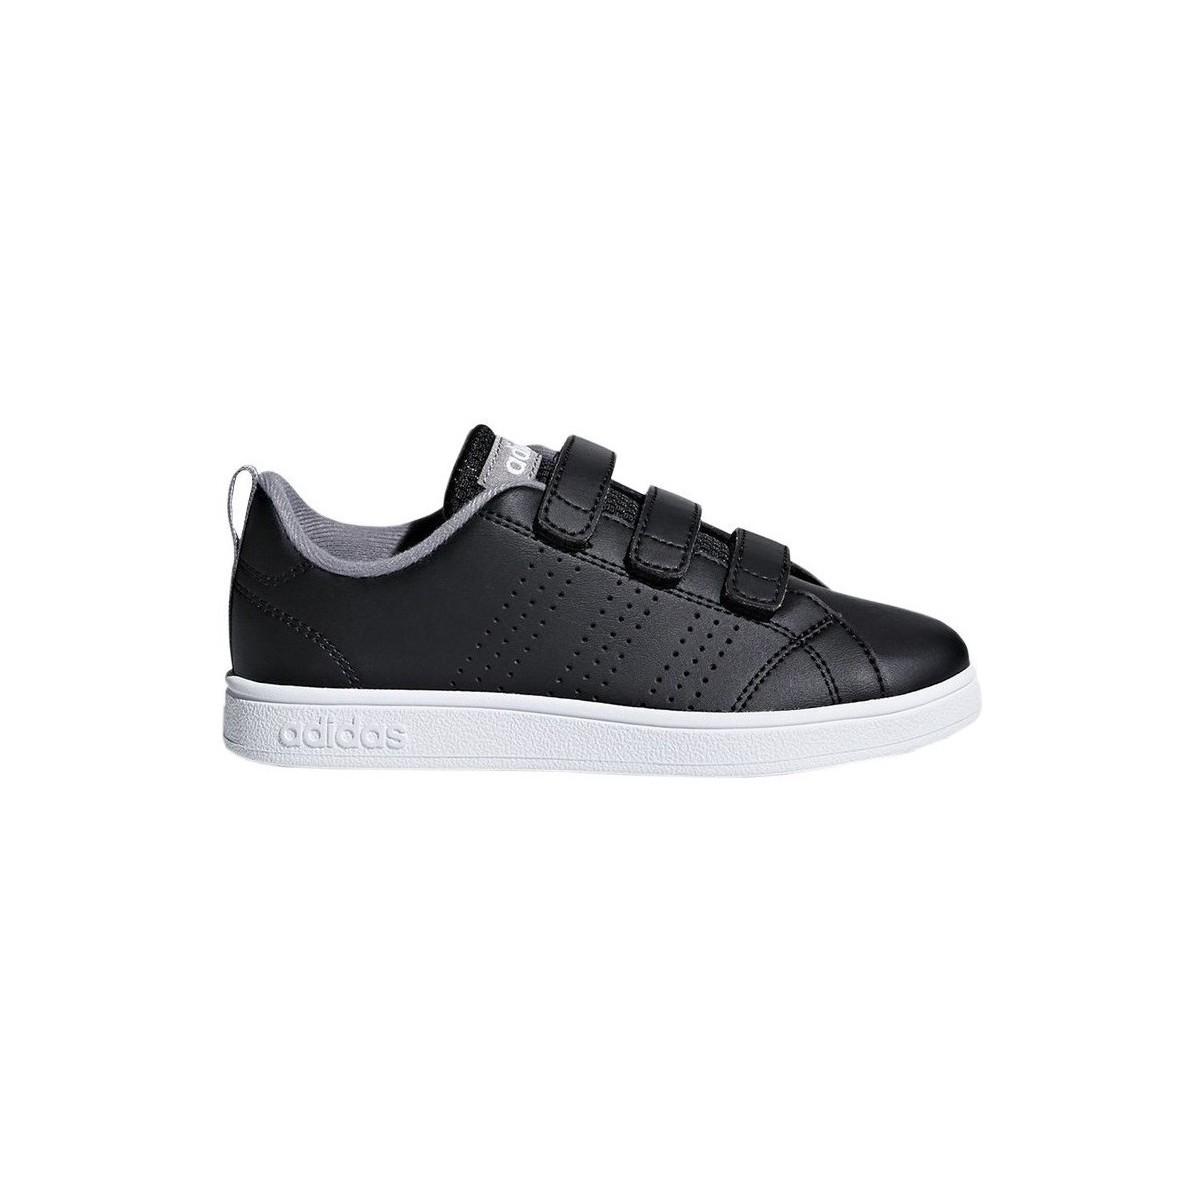 Sneakers adidas  VS Adv CL Cmf C